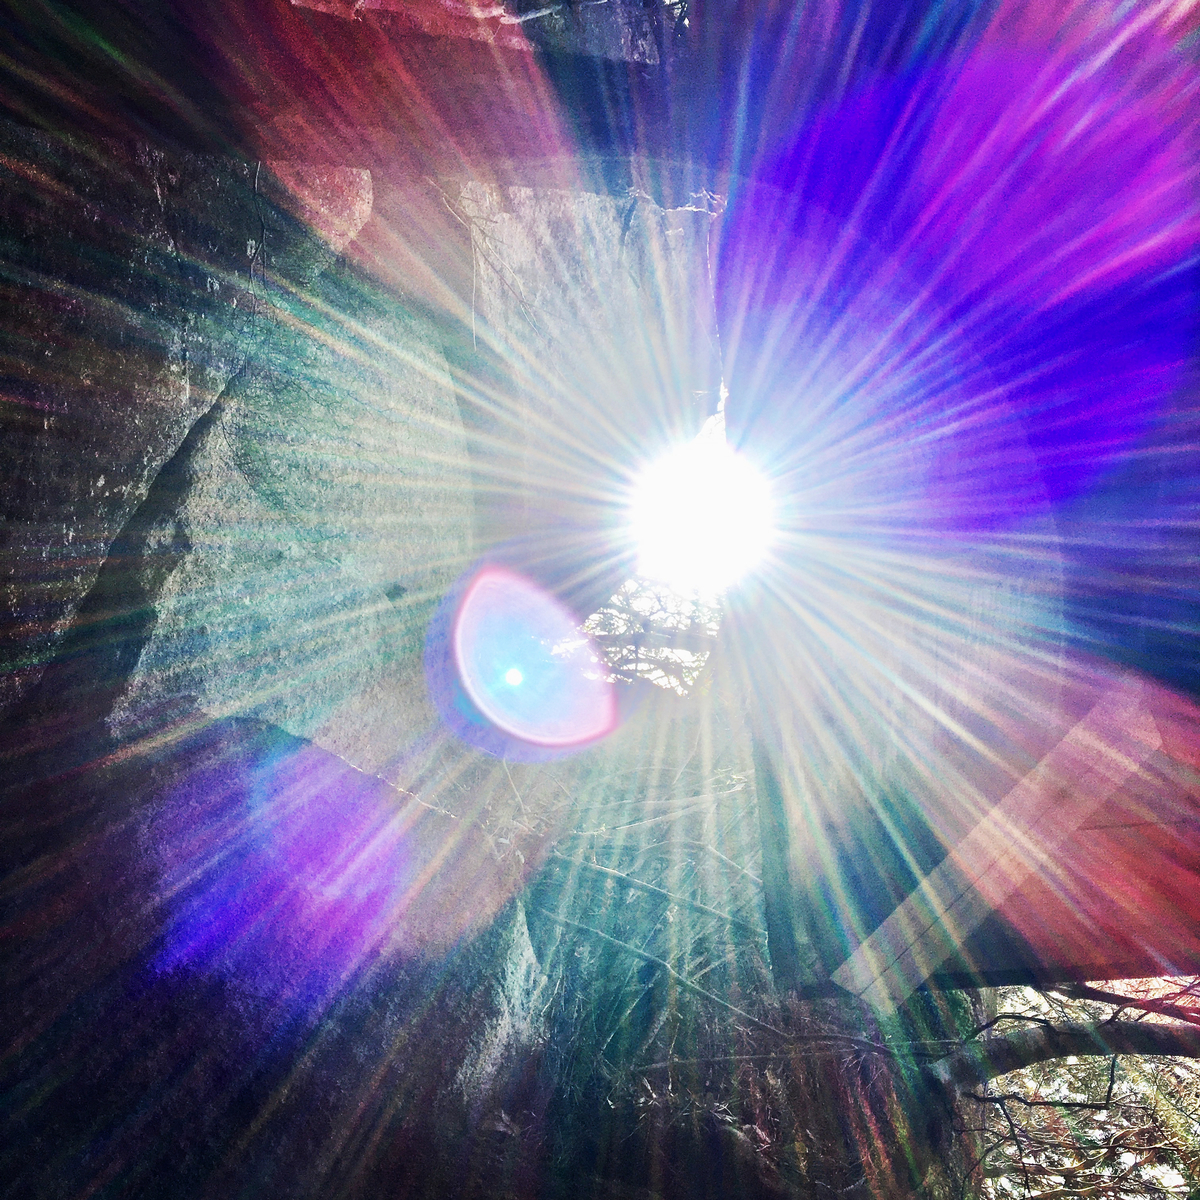 f:id:lemurian-crystal-NINA:20210404193923j:plain